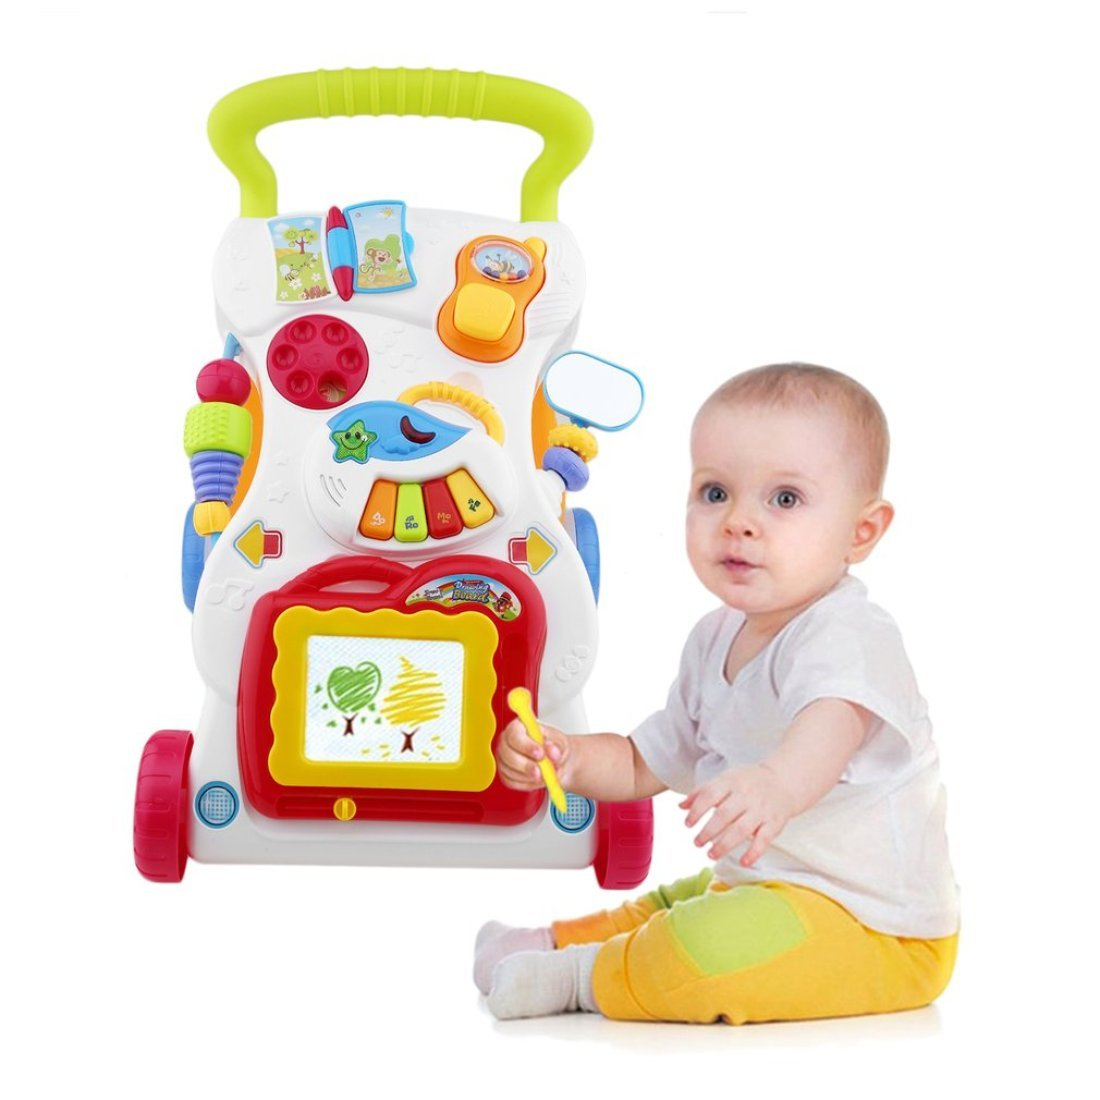 Baby Walker Multifunctional Toddler Sit-to-Stand Walker with Adjustable Screw Dailyinshop